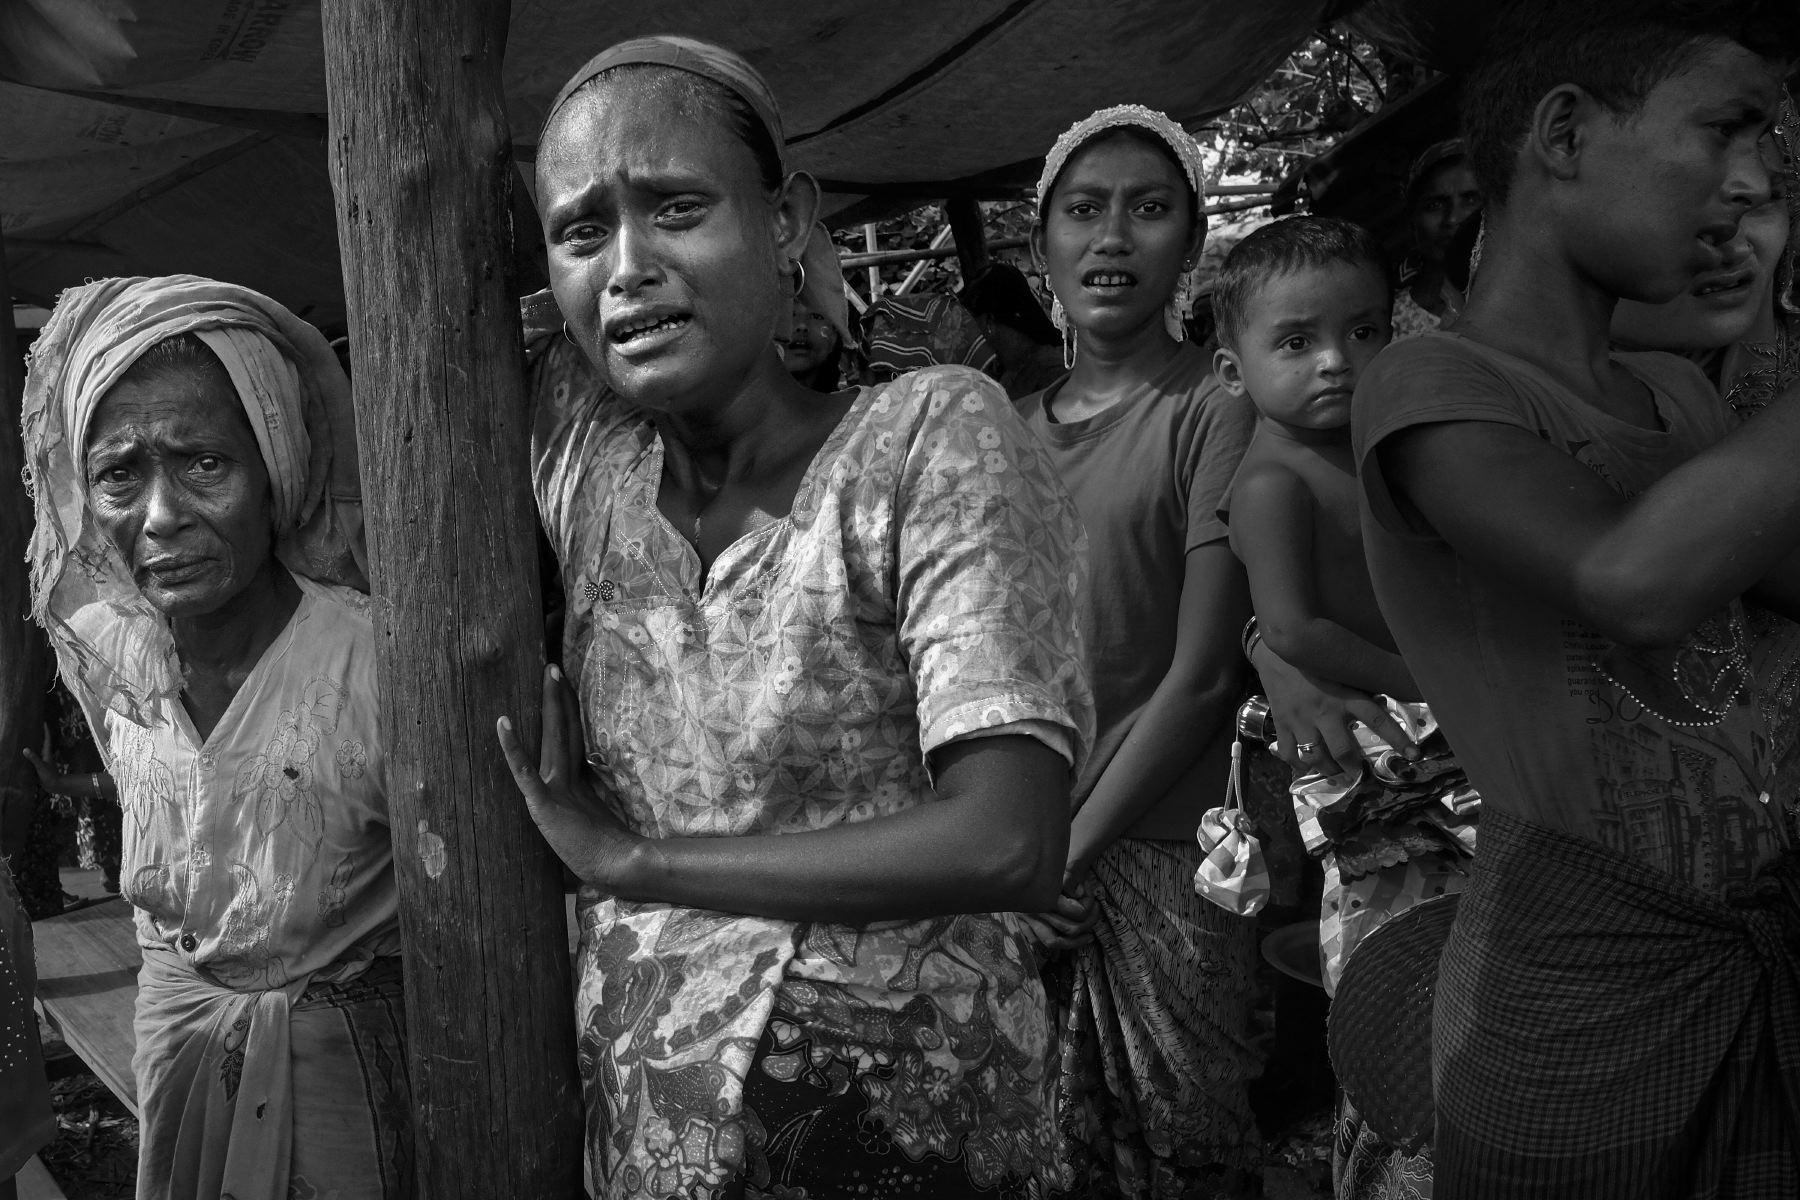 AlainSchroeder_Series Rohingyas_Untitled_04.JPG